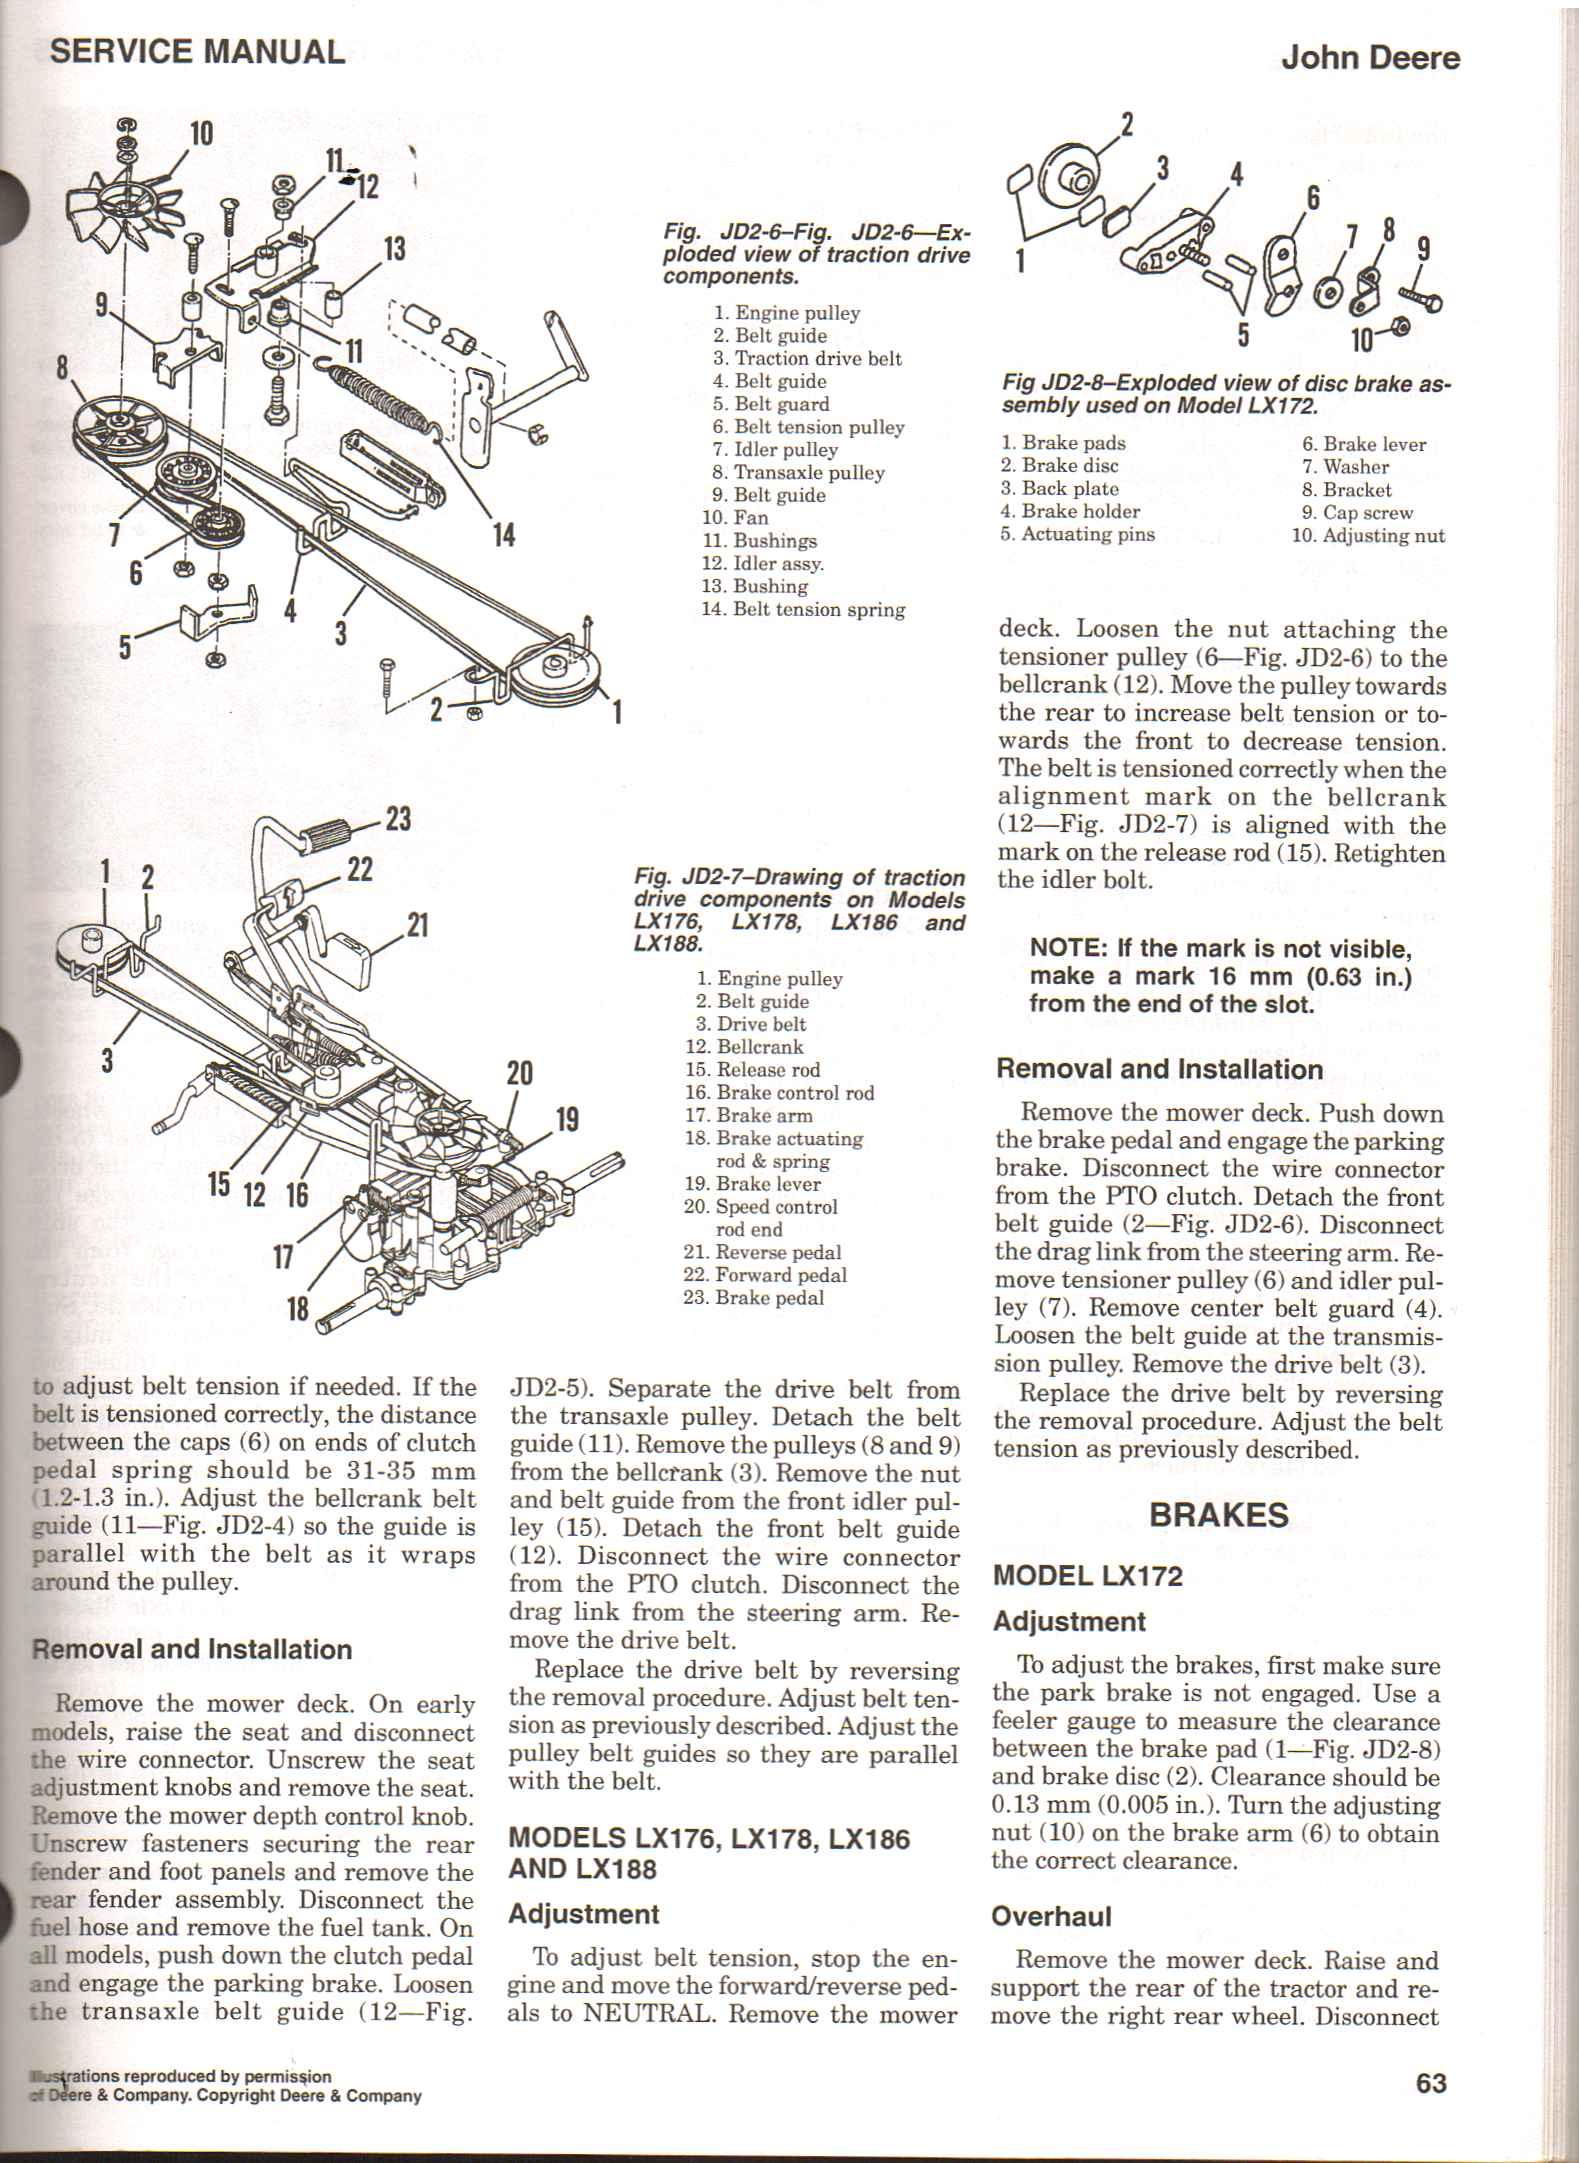 how do change drive belt on lx188 rh justanswer com John Deere LX188 Repair Manual John Deere LX188 Mower Deck